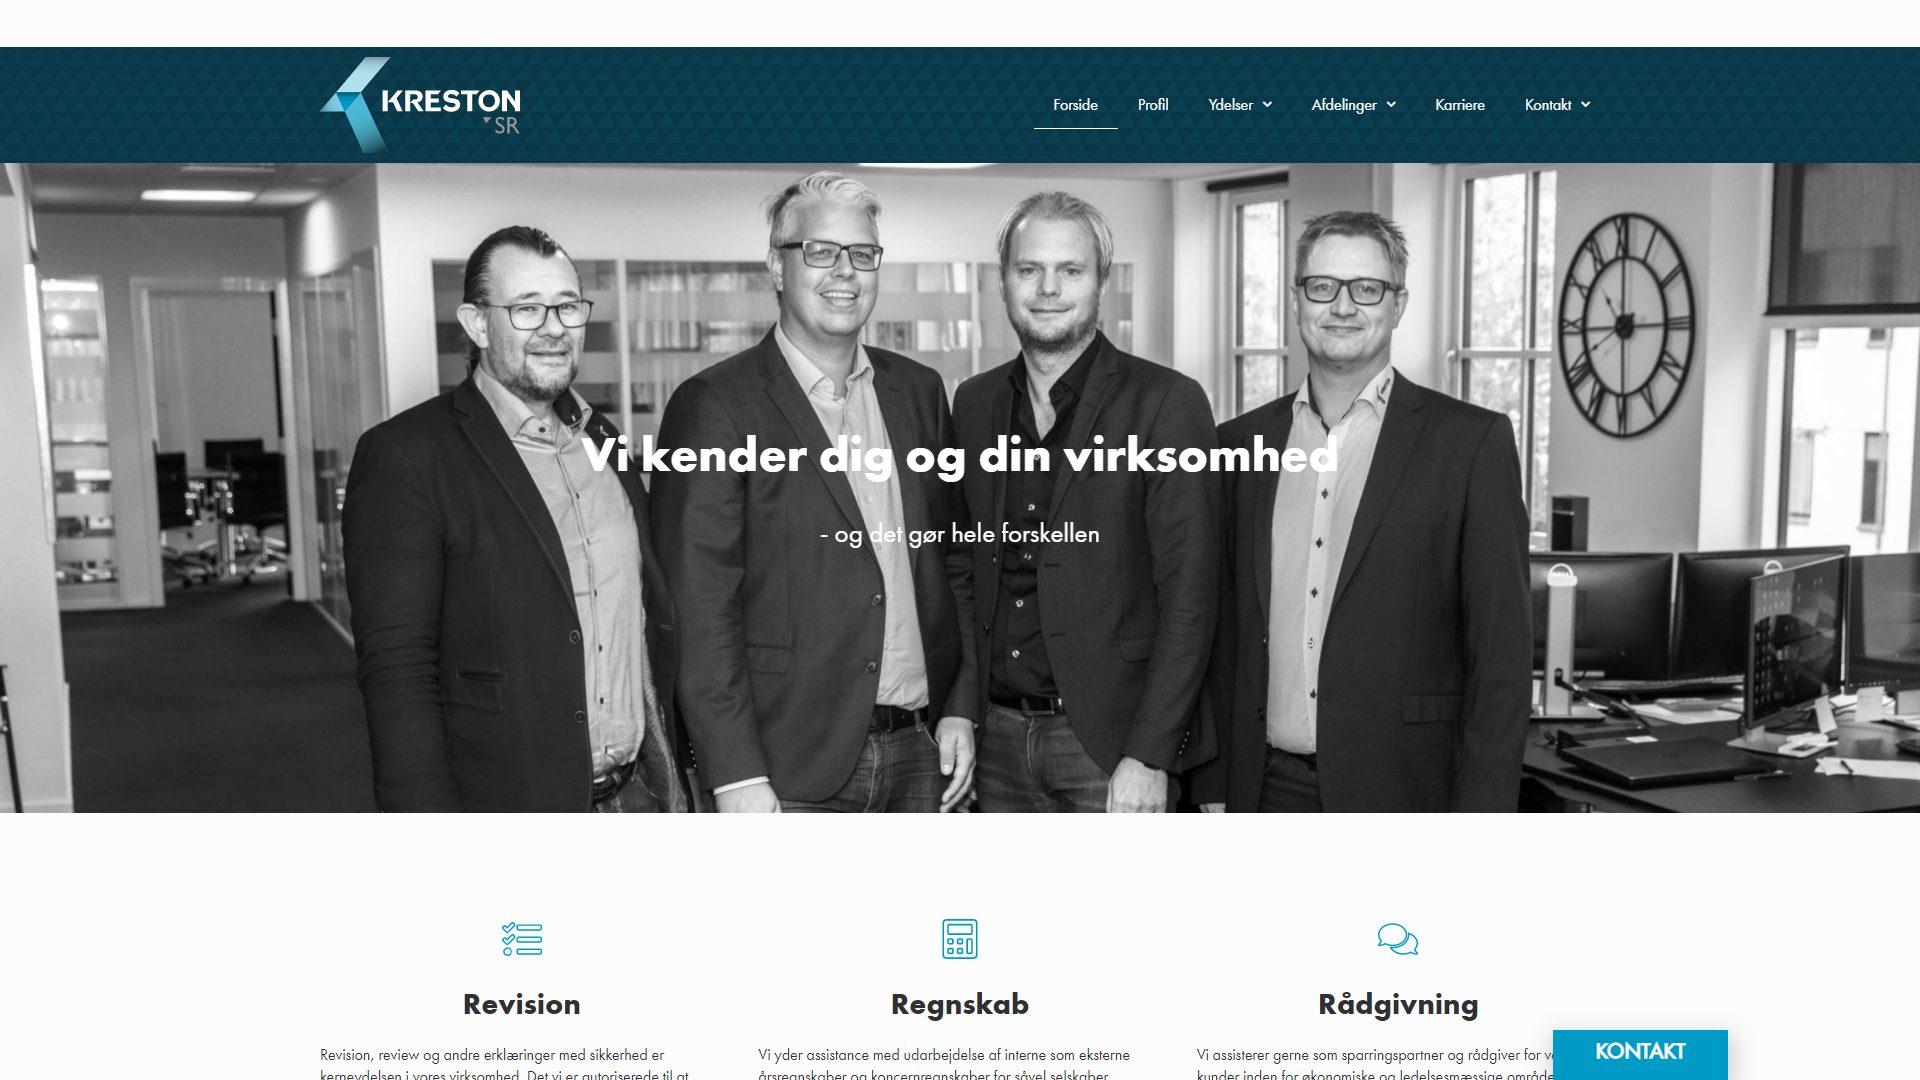 KrestonSR_web_case